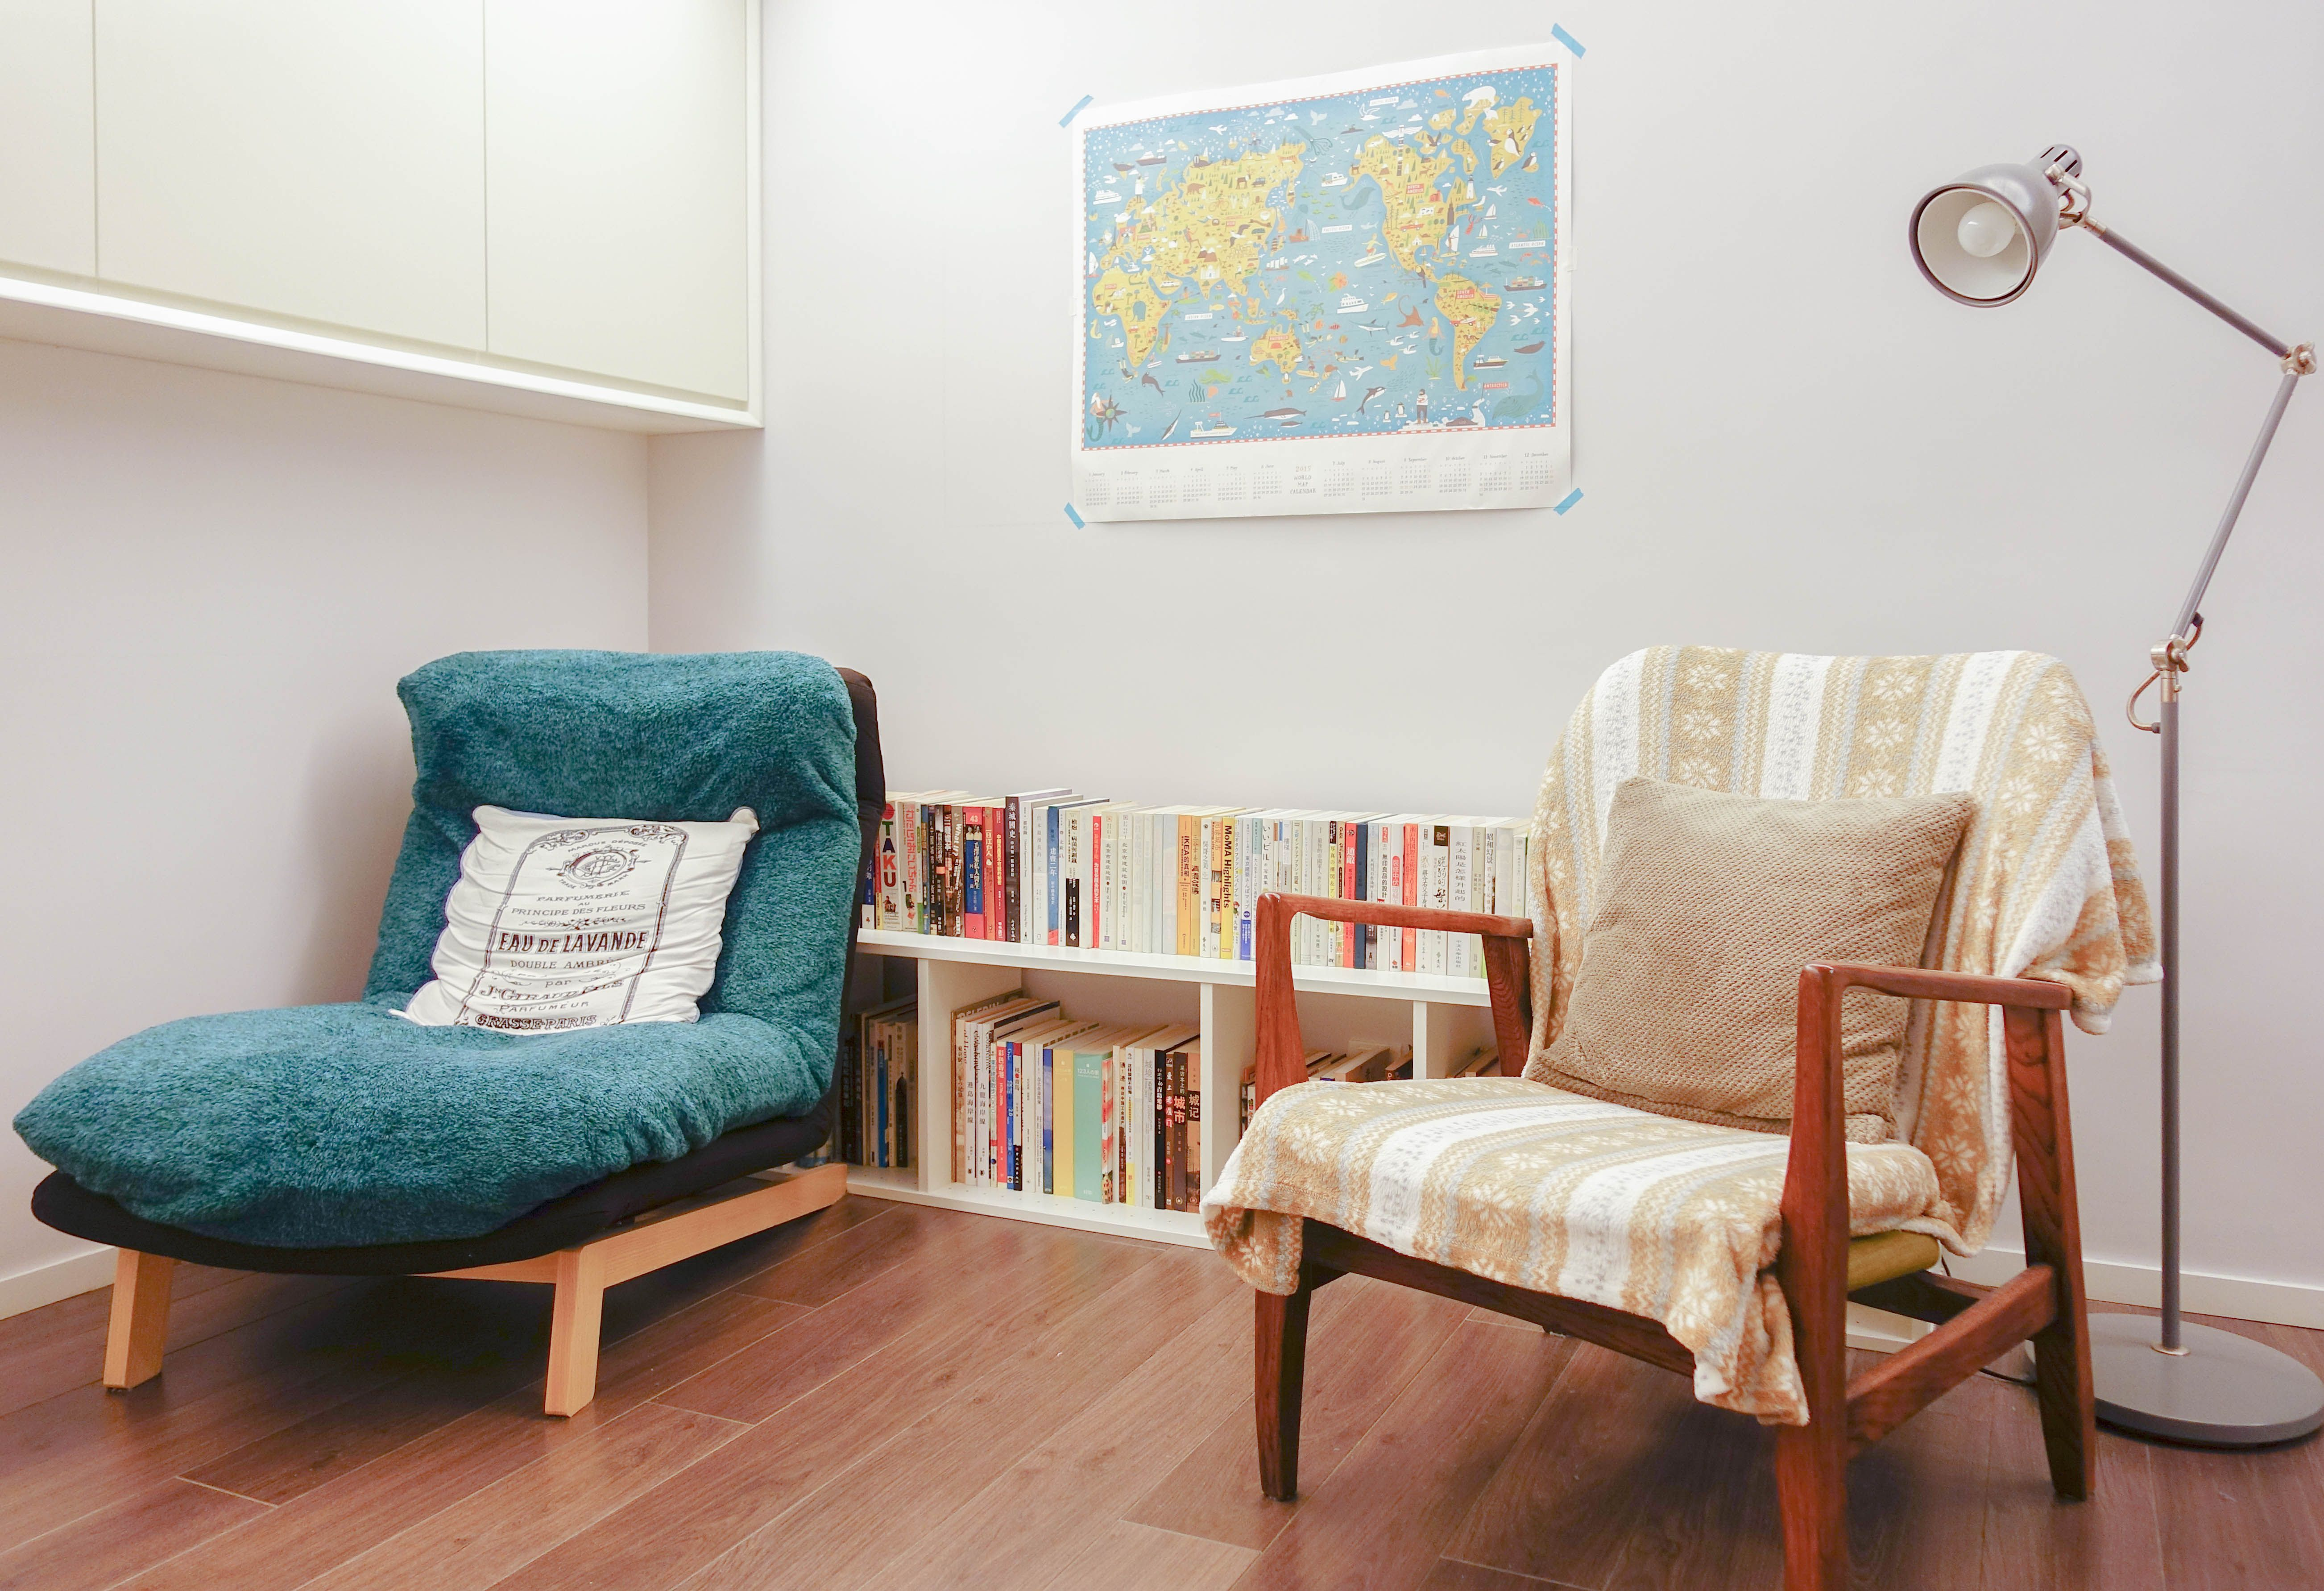 Woonkamer Van Muji : Muji armchair nikoand blanklet franc franc cushion ikea